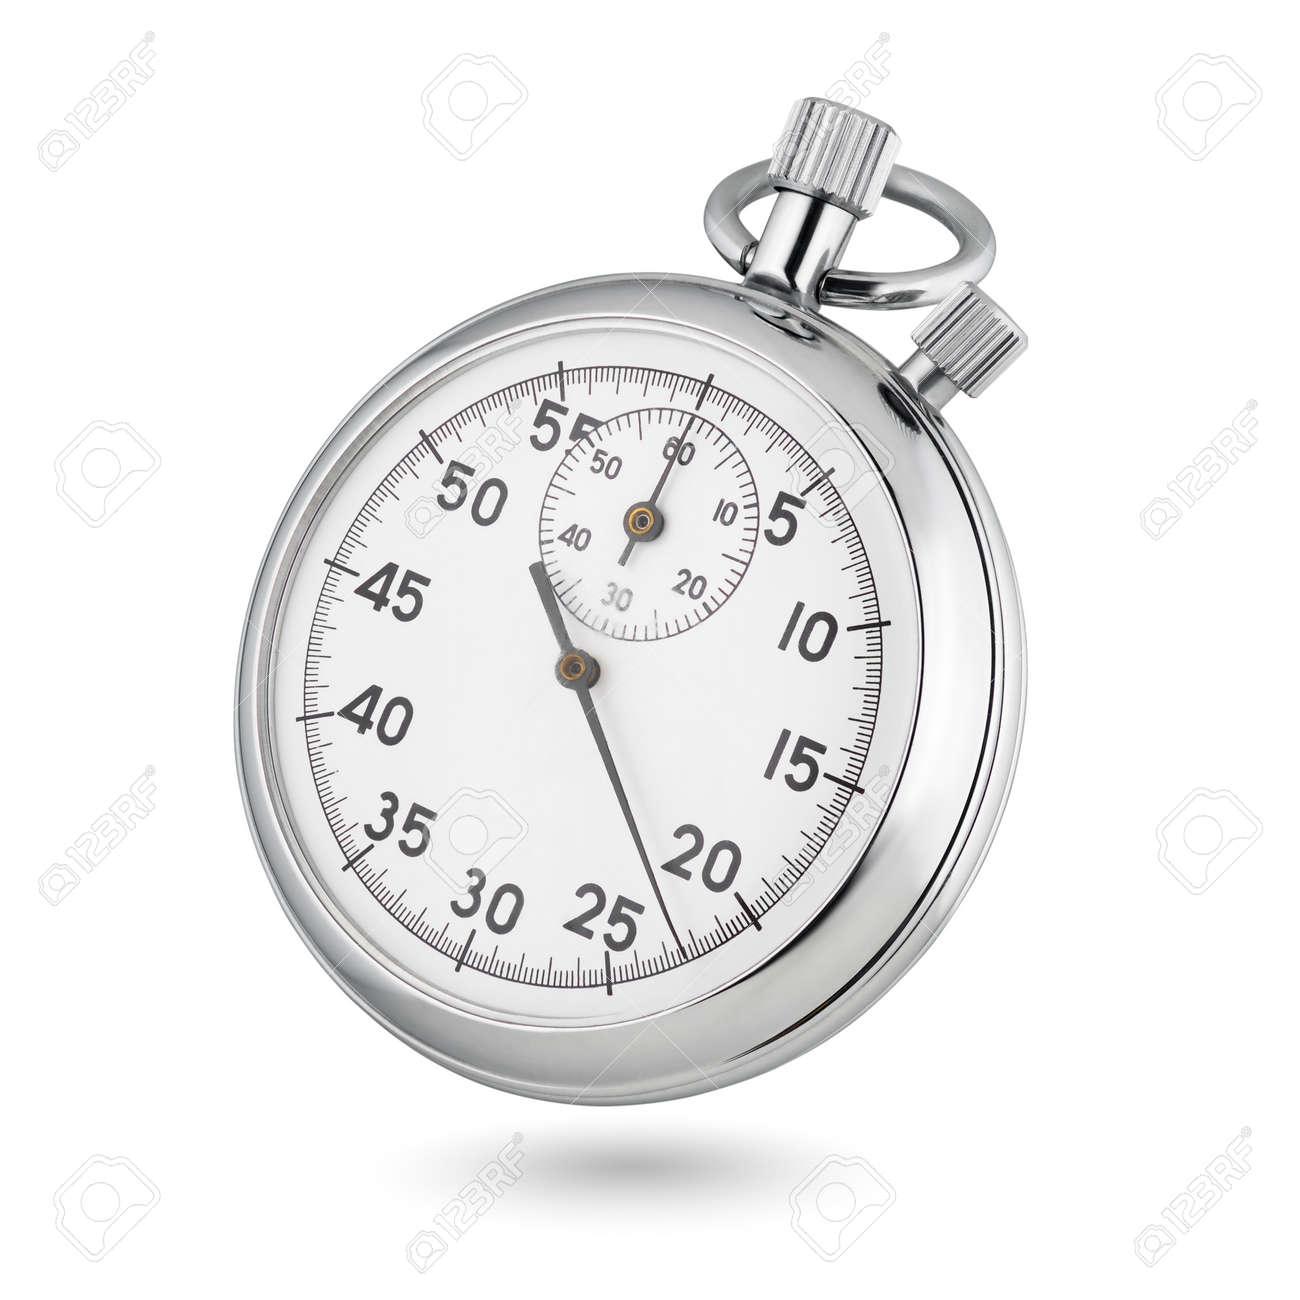 Classic metallic chrome mechanical analog stopwatch isolated on white background. - 135622782